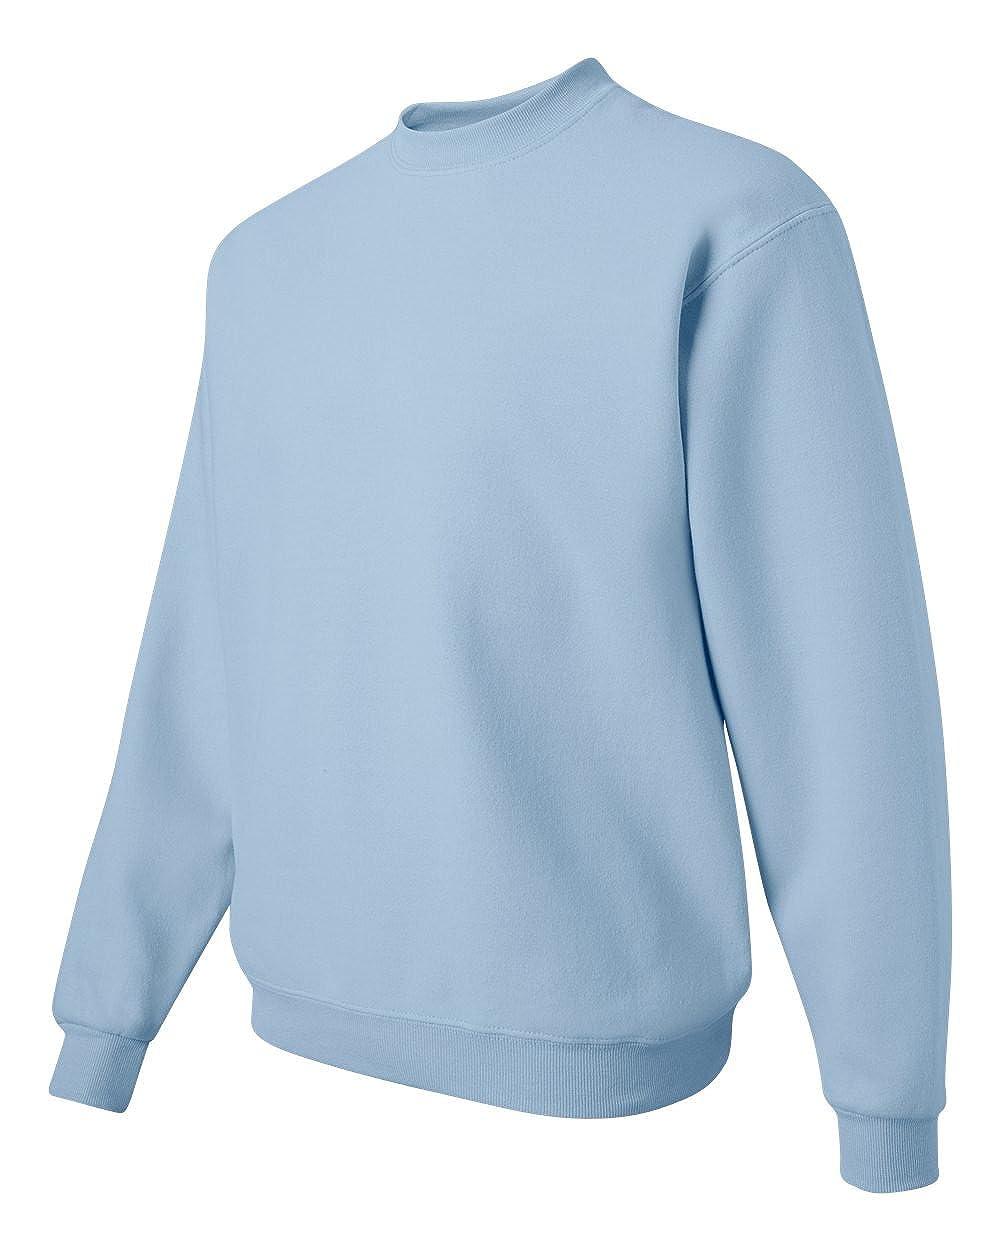 Jerzees mens 8 oz -LIGHT BLUE-S 50//50 NuBlend Fleece Crew 562